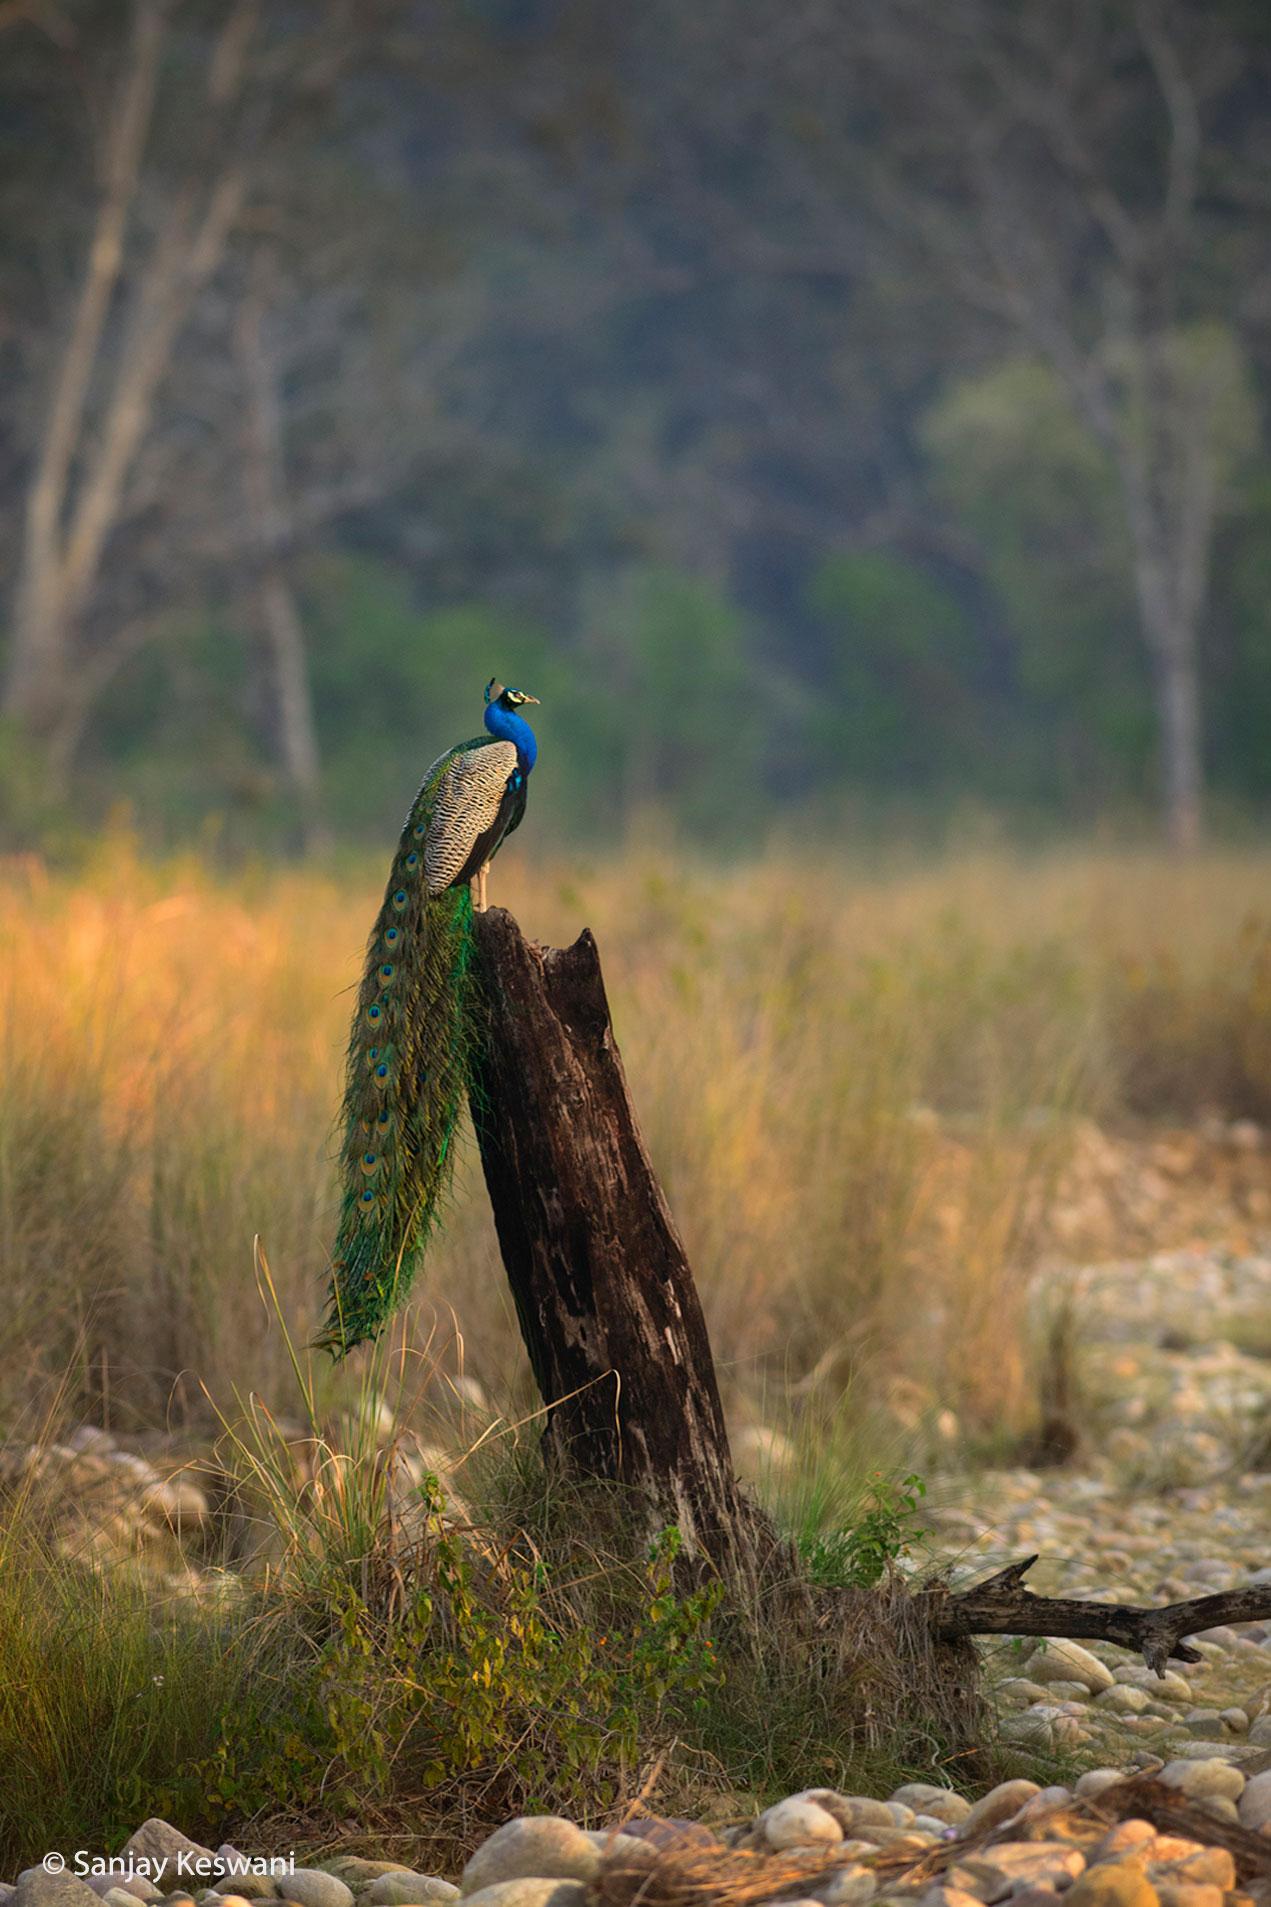 © Sanjay Keswani